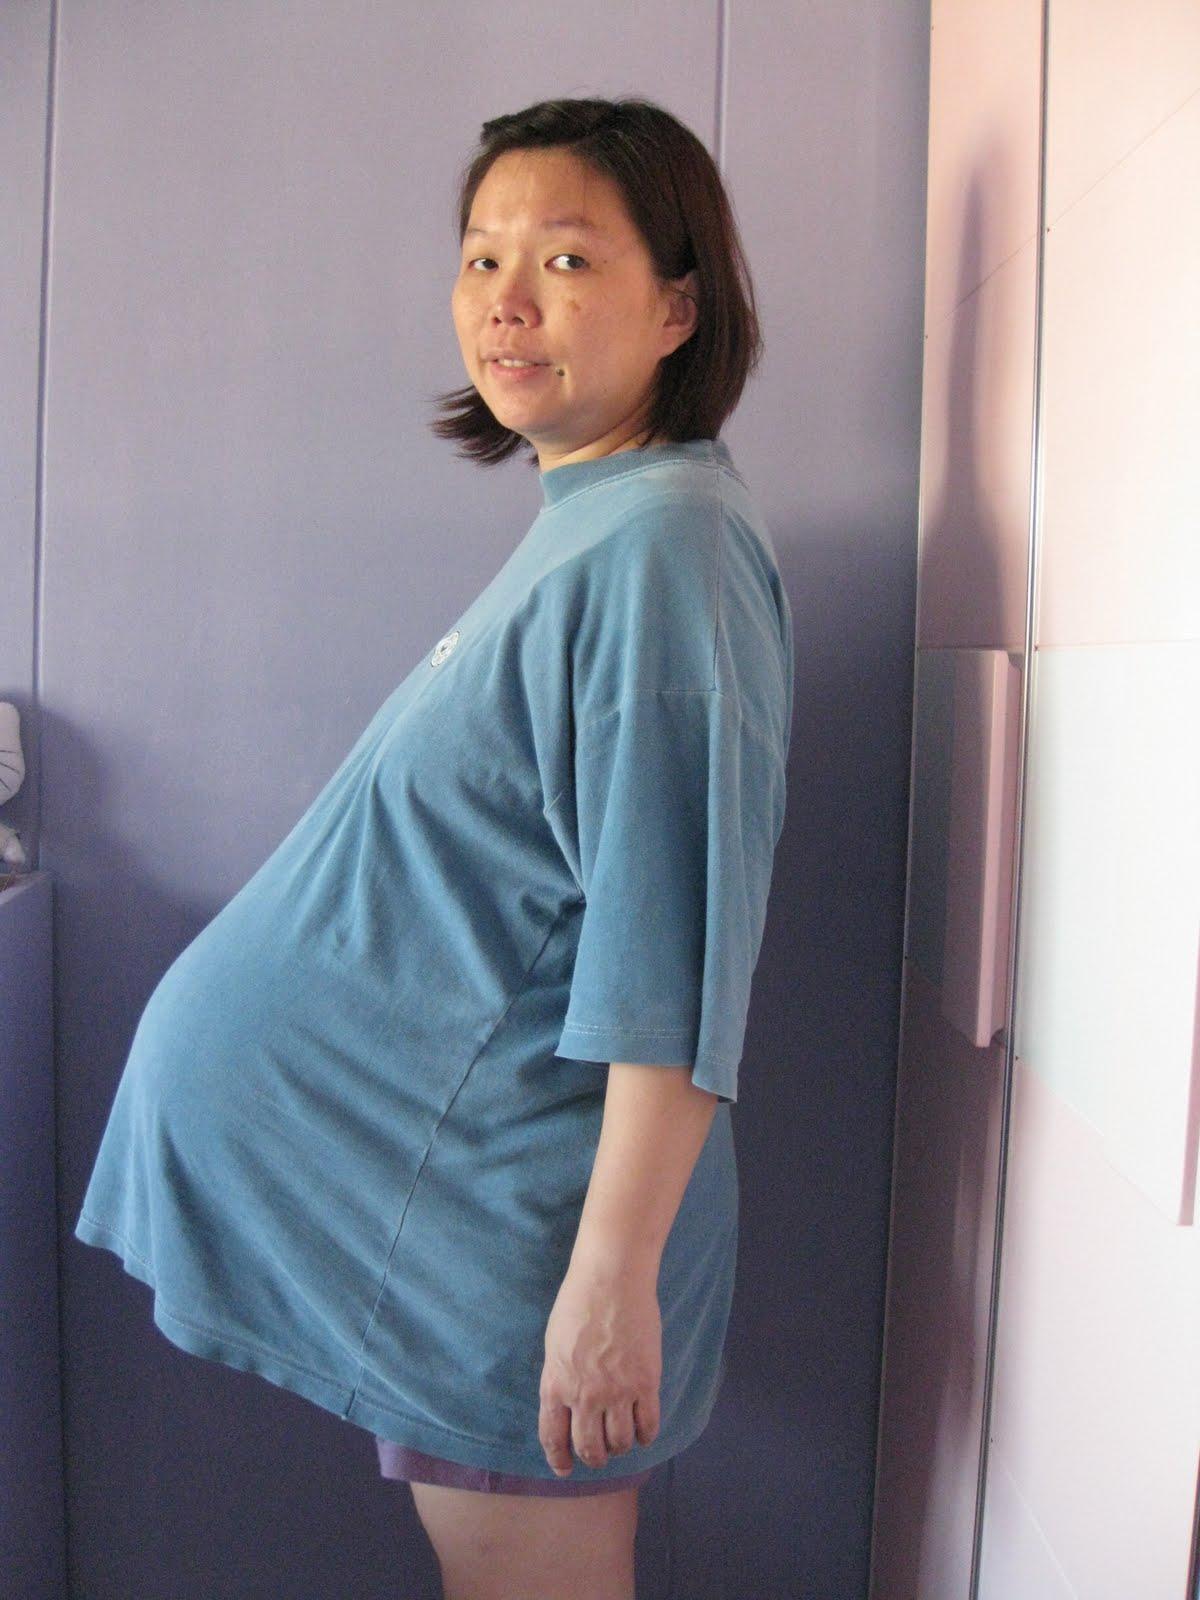 Lasix and pregnancy